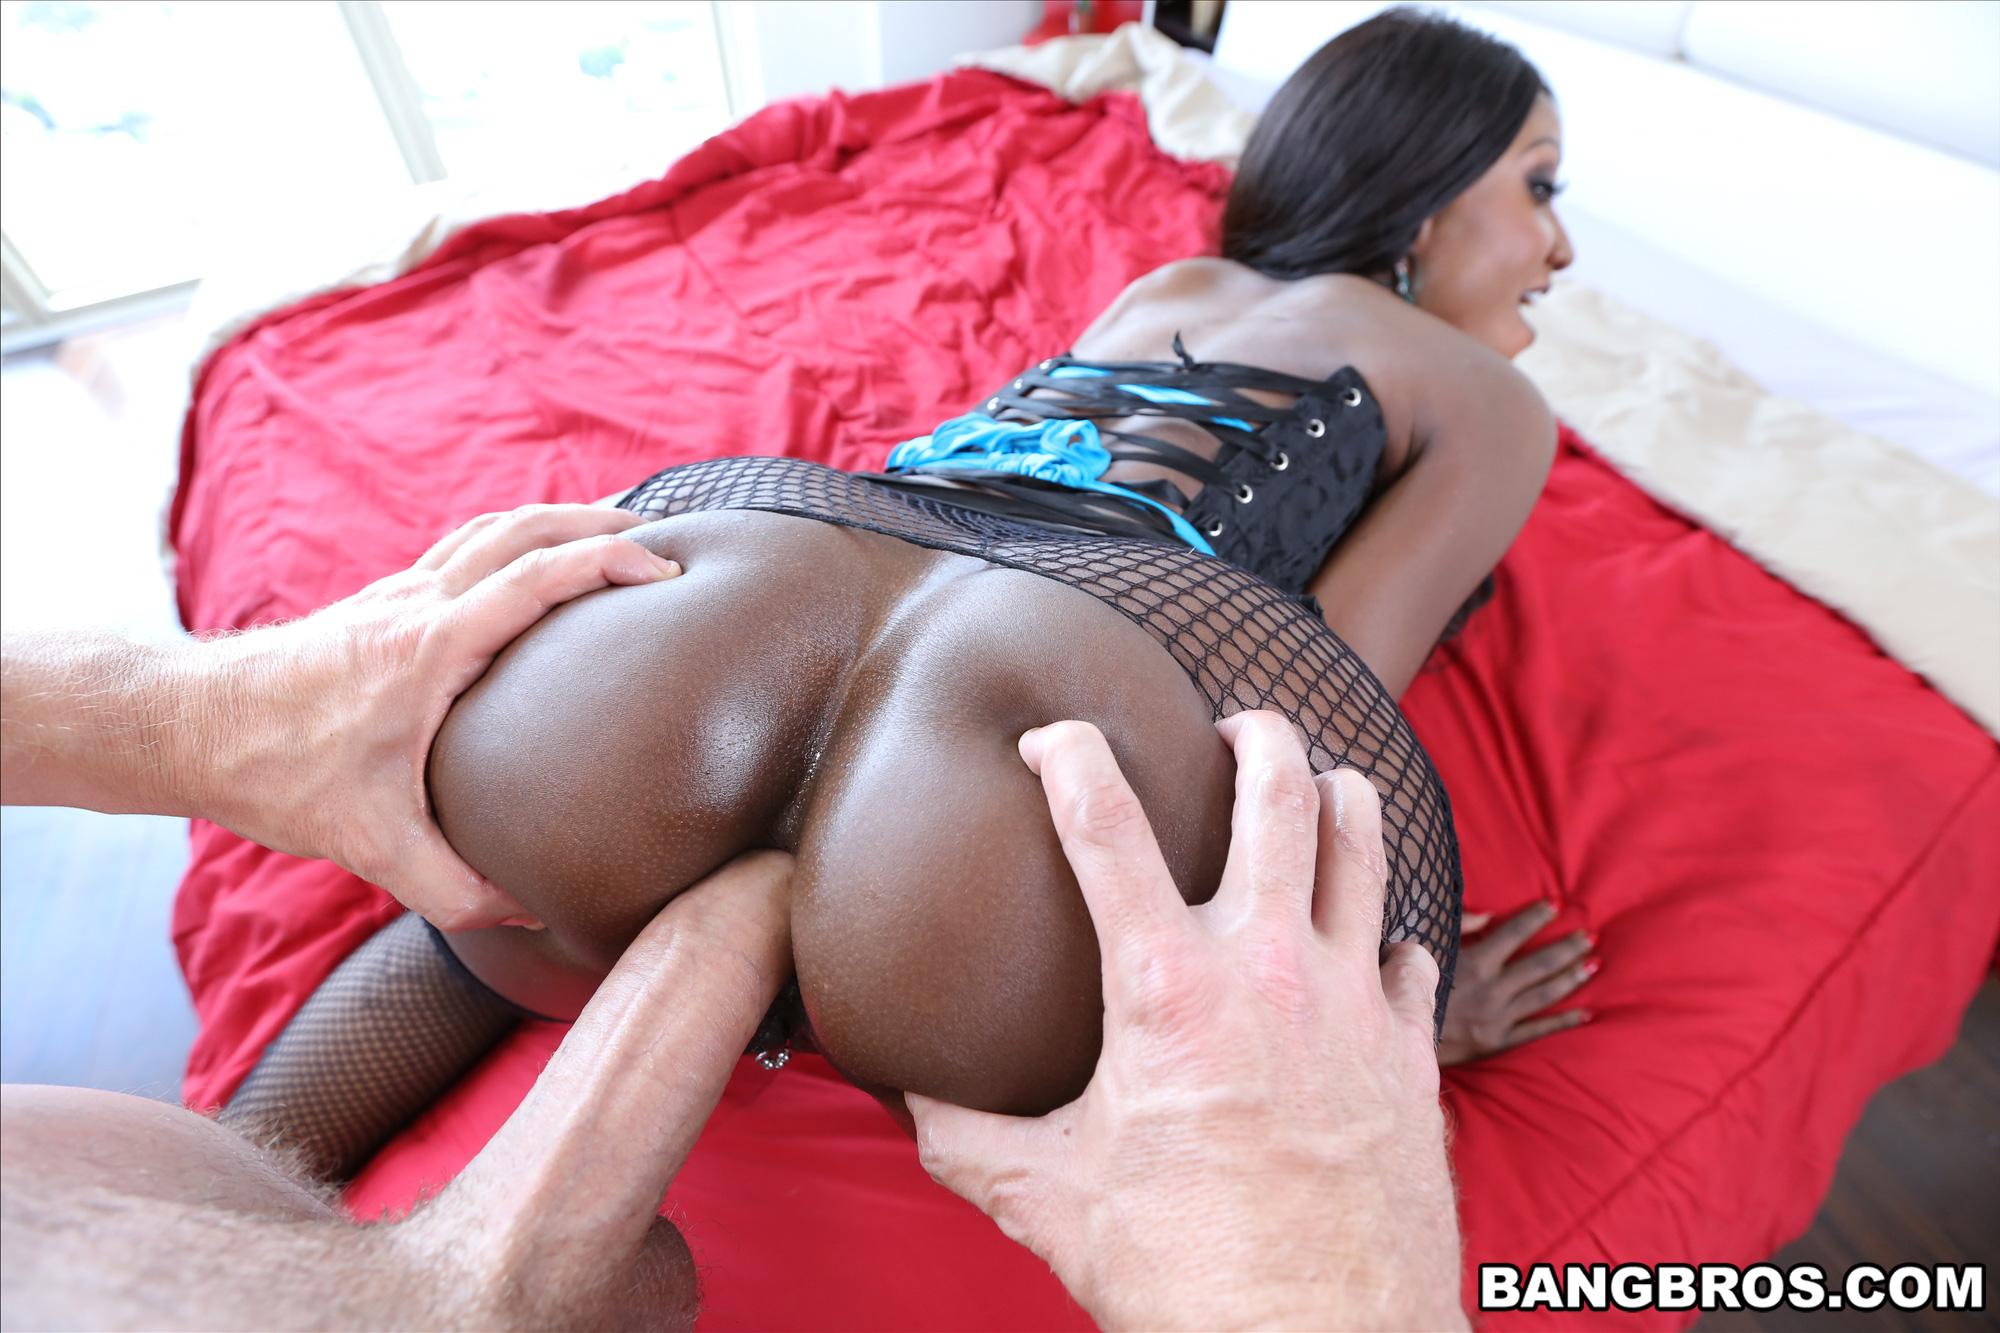 Huge shemale anal cock